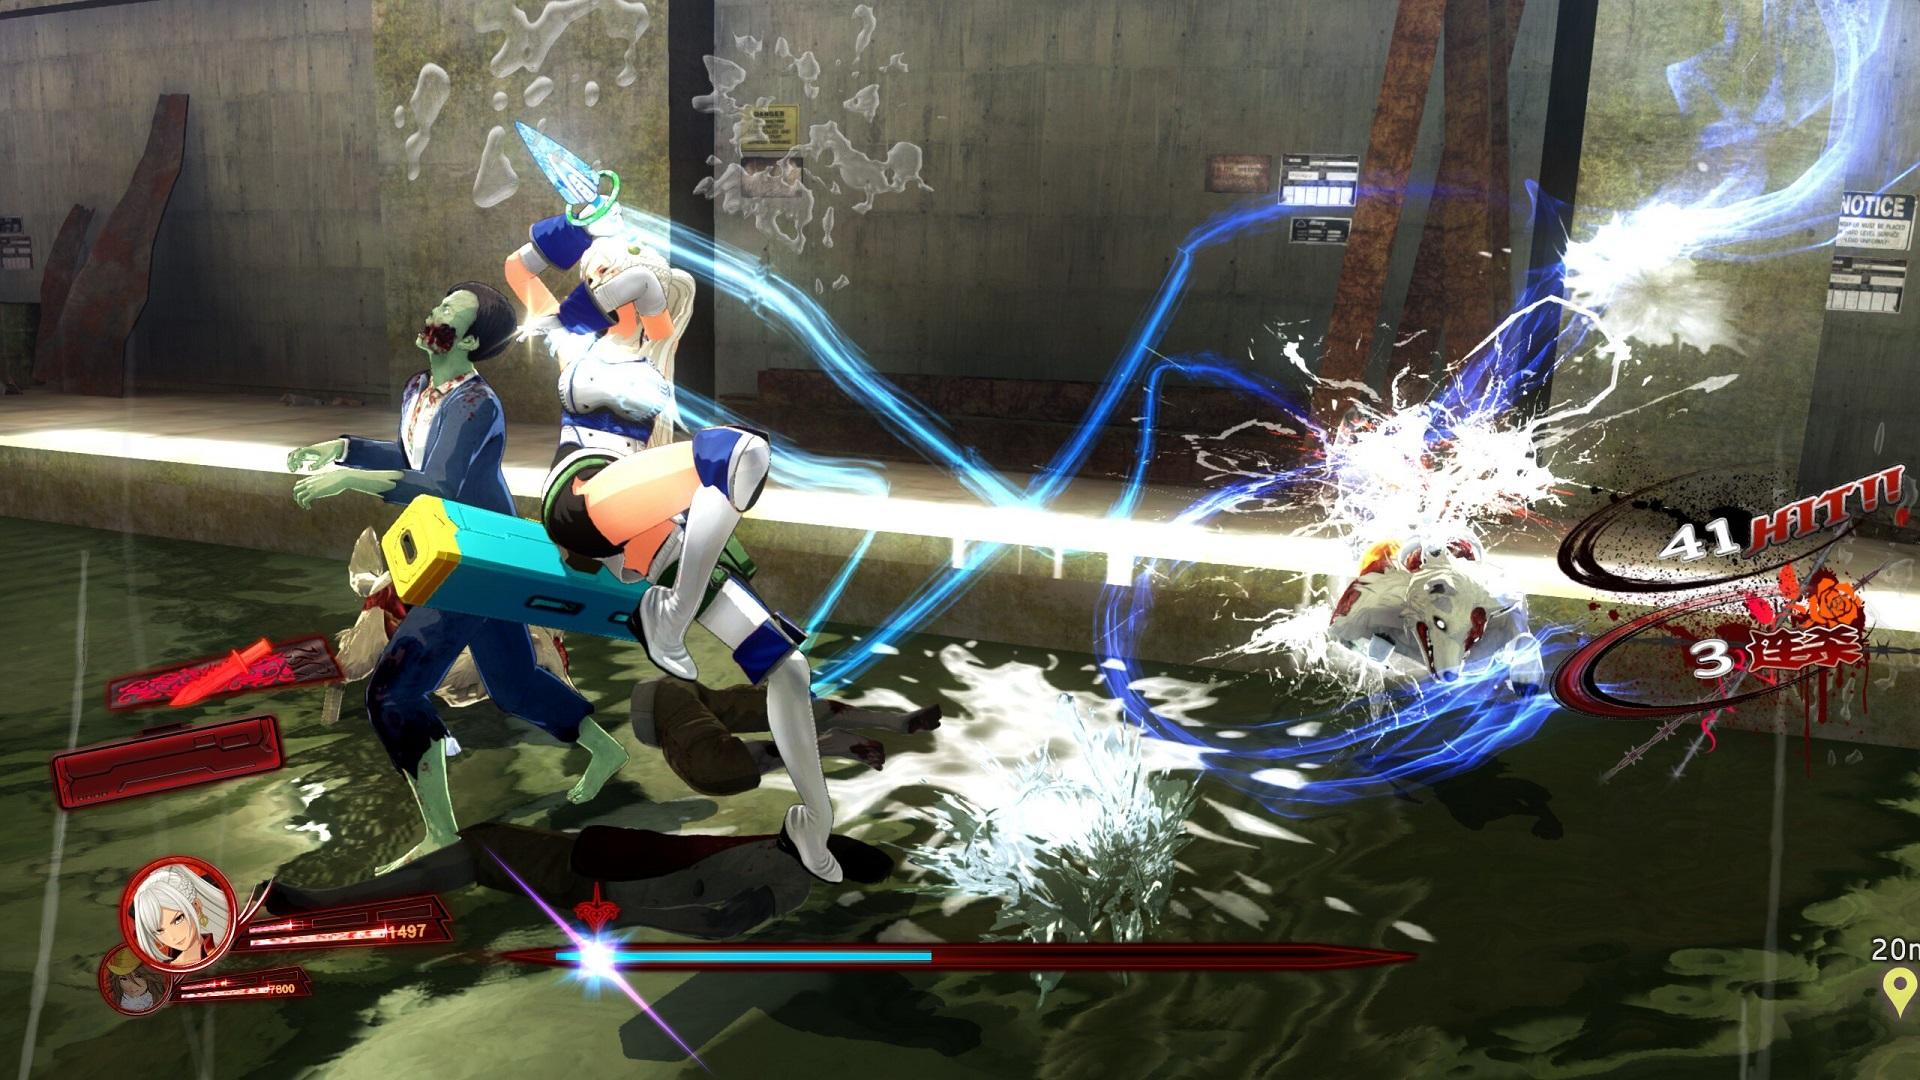 onee-chanbara-origin-pc-screenshot-2